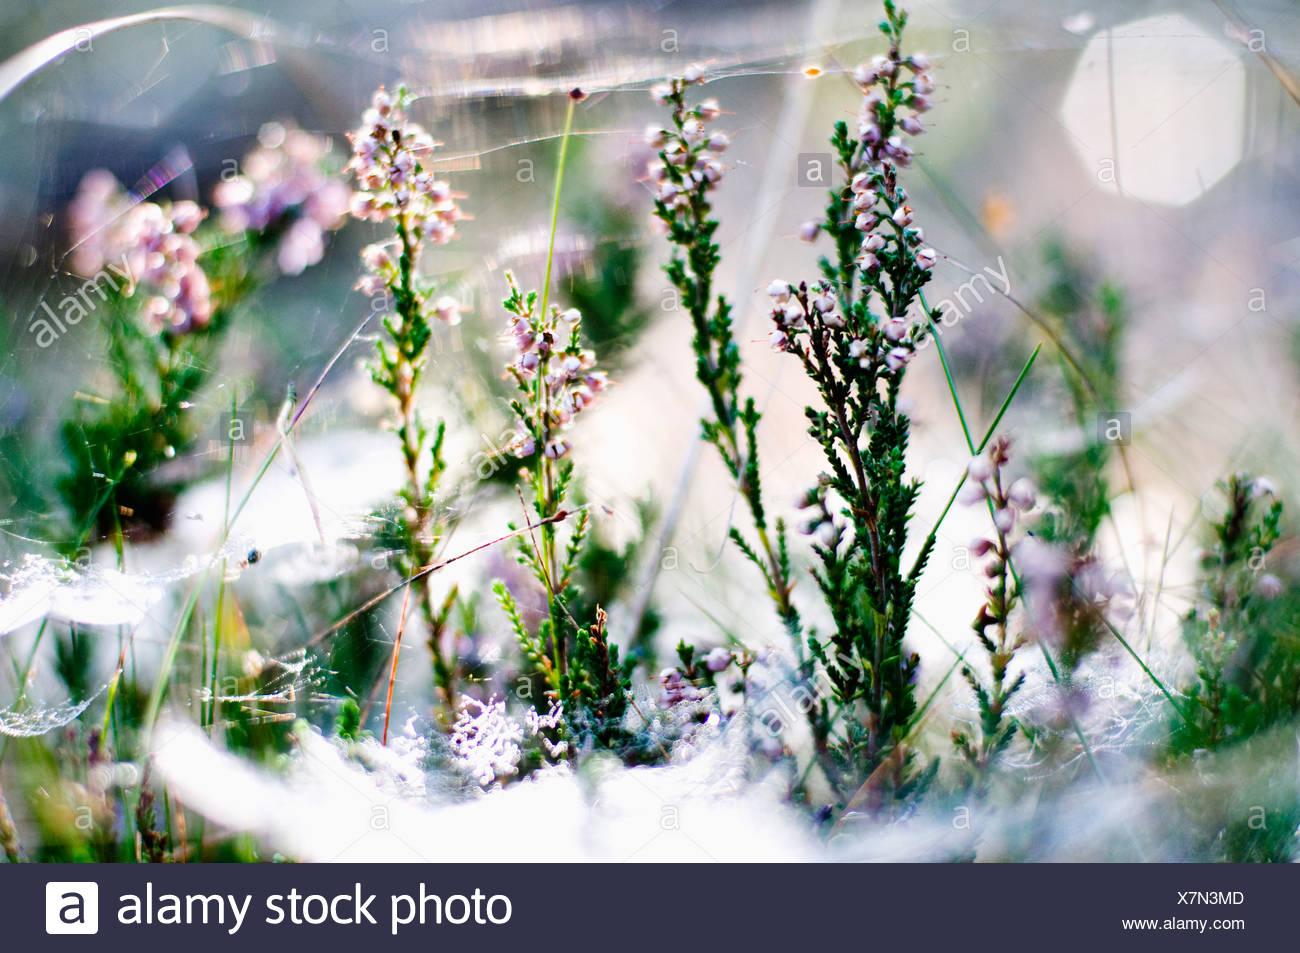 Dream plant - Stock Image